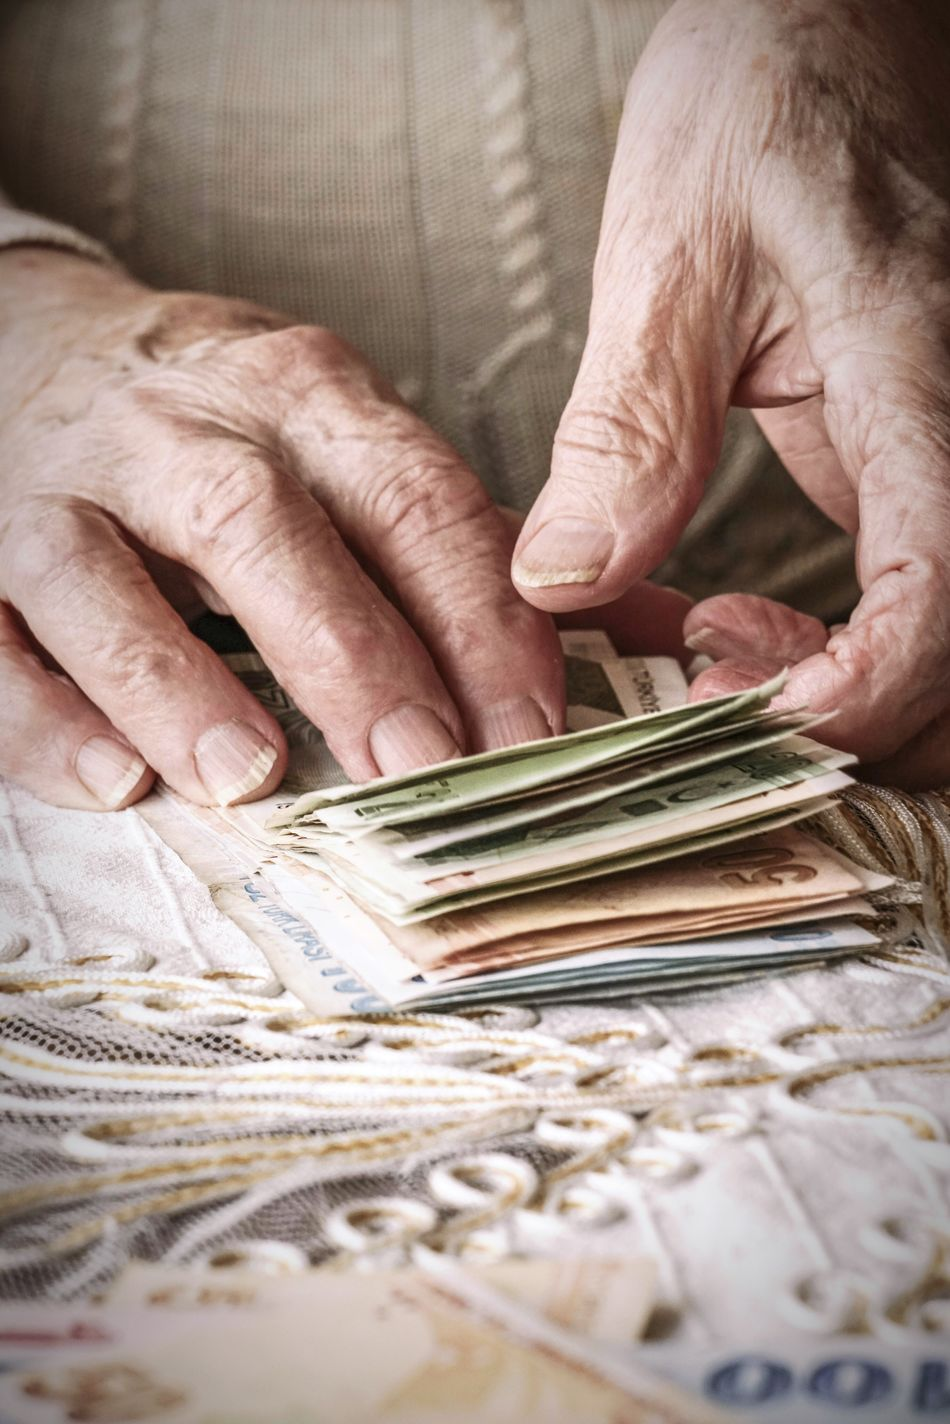 Human Hand Senior Adult Wrinkled Senior Women Close-up Holding People Money TurkishLira Currency Counting Salary Fingers Man Woman Wrinkles Wrinkled Skin Earnings Fresh On Market 2017